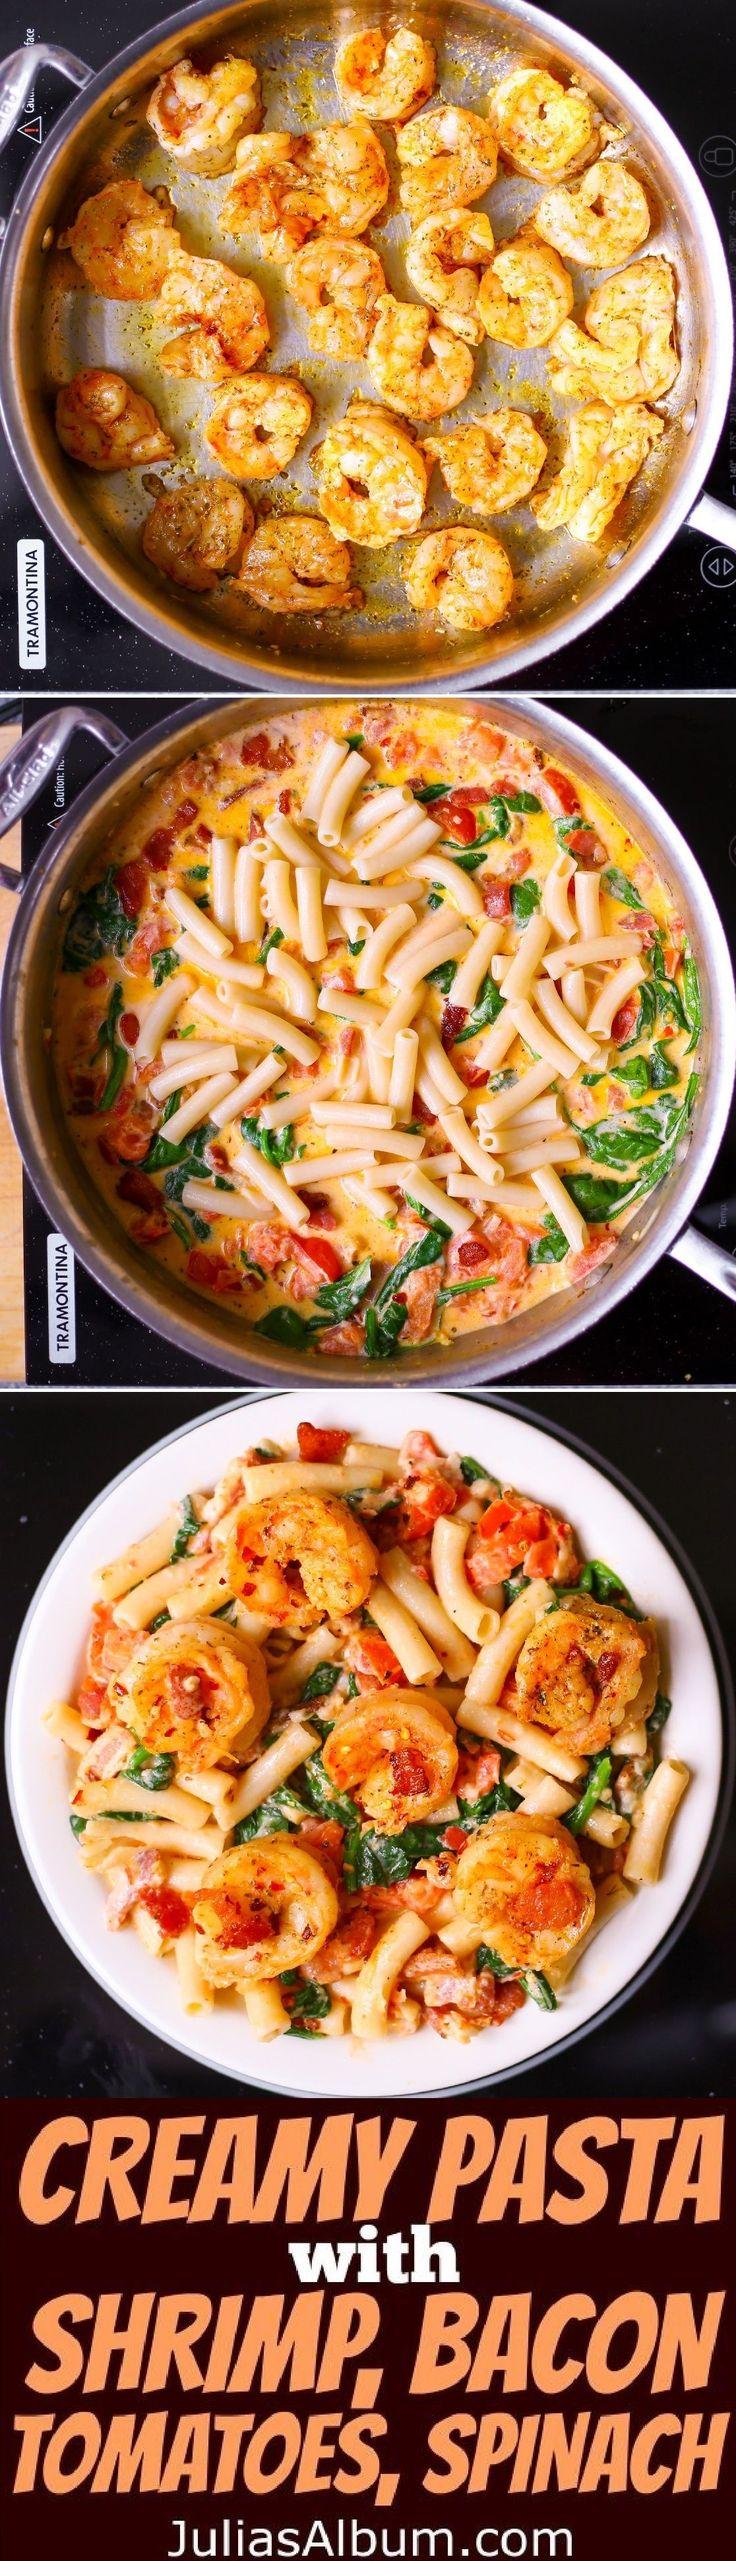 Creamy Pasta with Shrimp, Bacon, Spinach, Tomatoes, Garlic. (Bake Shrimp Recipes) #seafoodrecipes